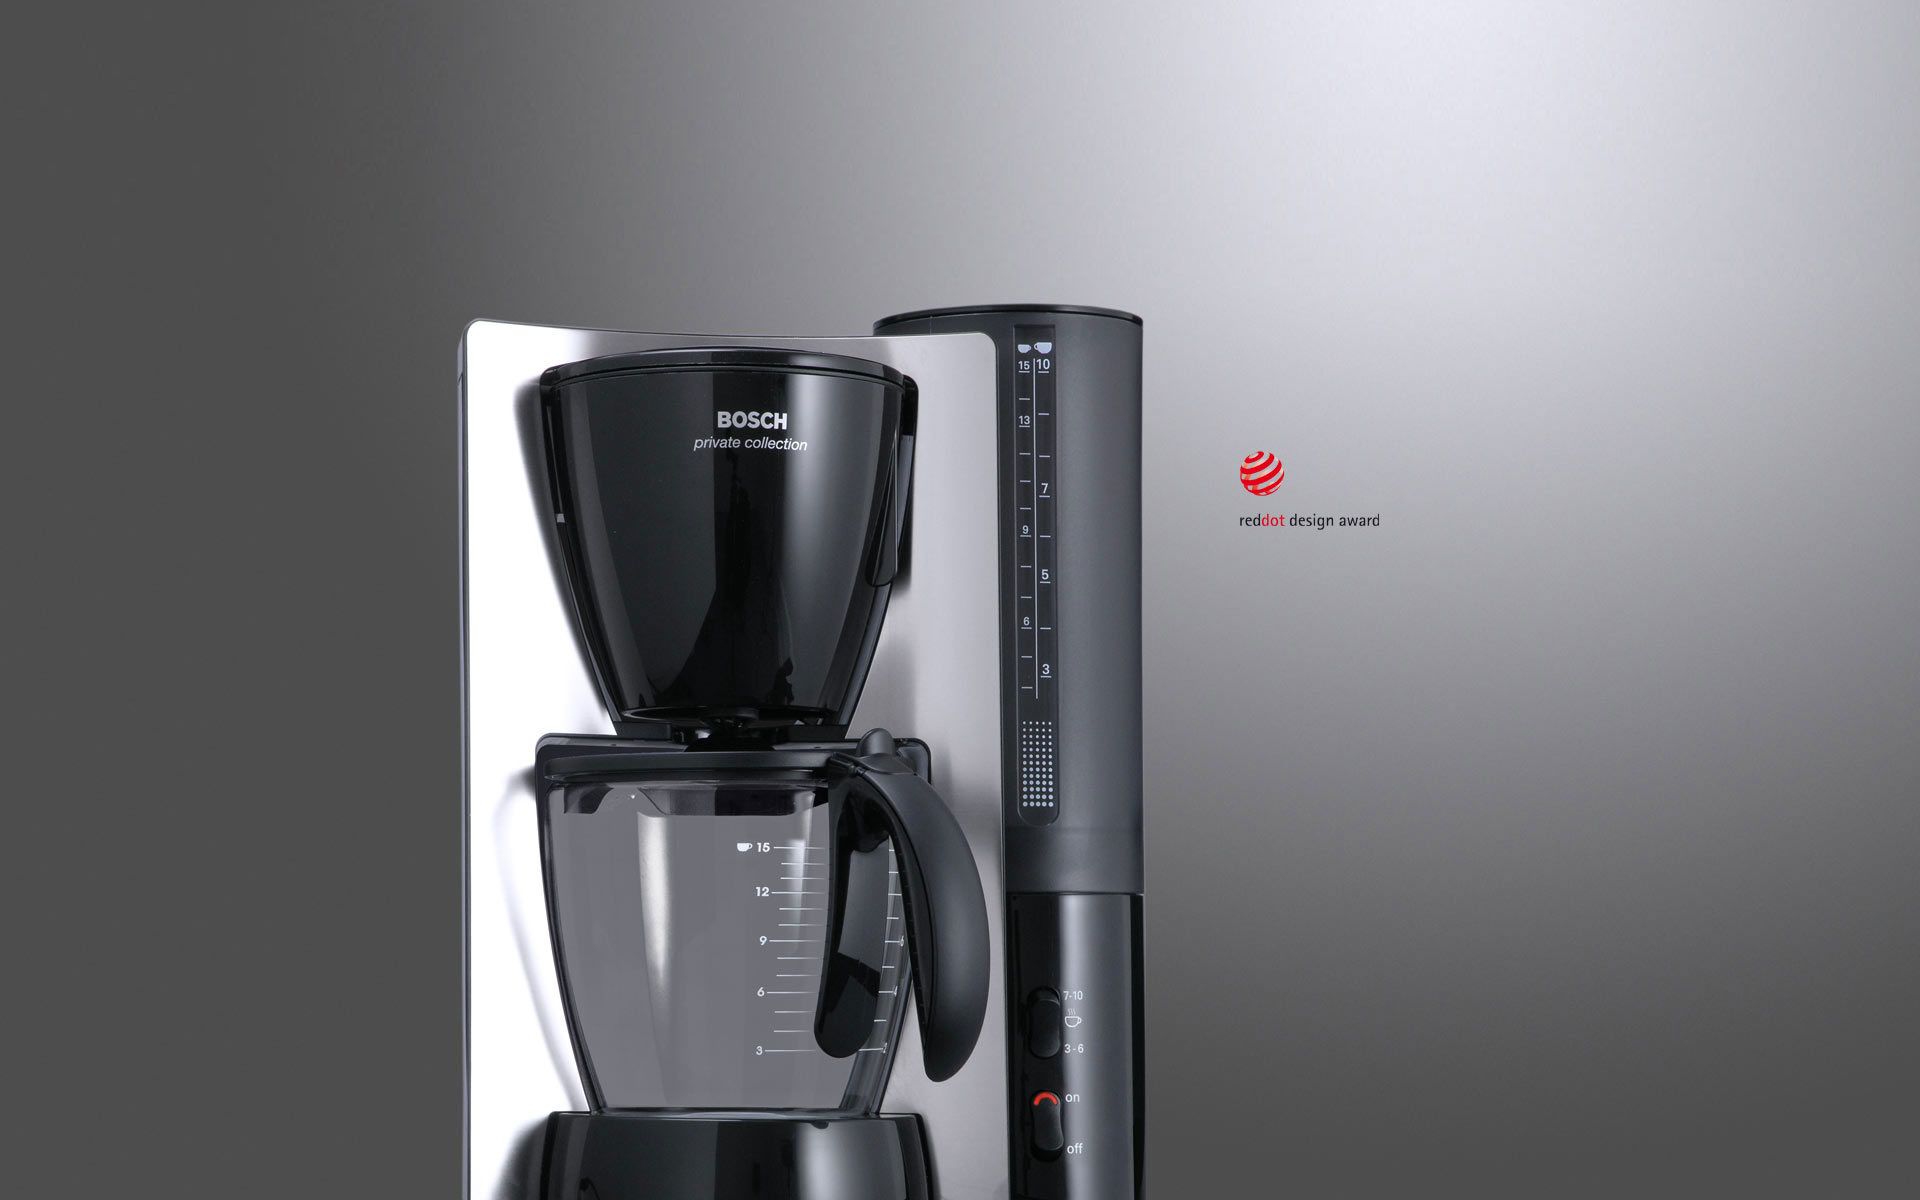 Bosch Kaffeemaschine Privat Collection Produktdesigner d+e für Bosch Siemens Hausgeräte